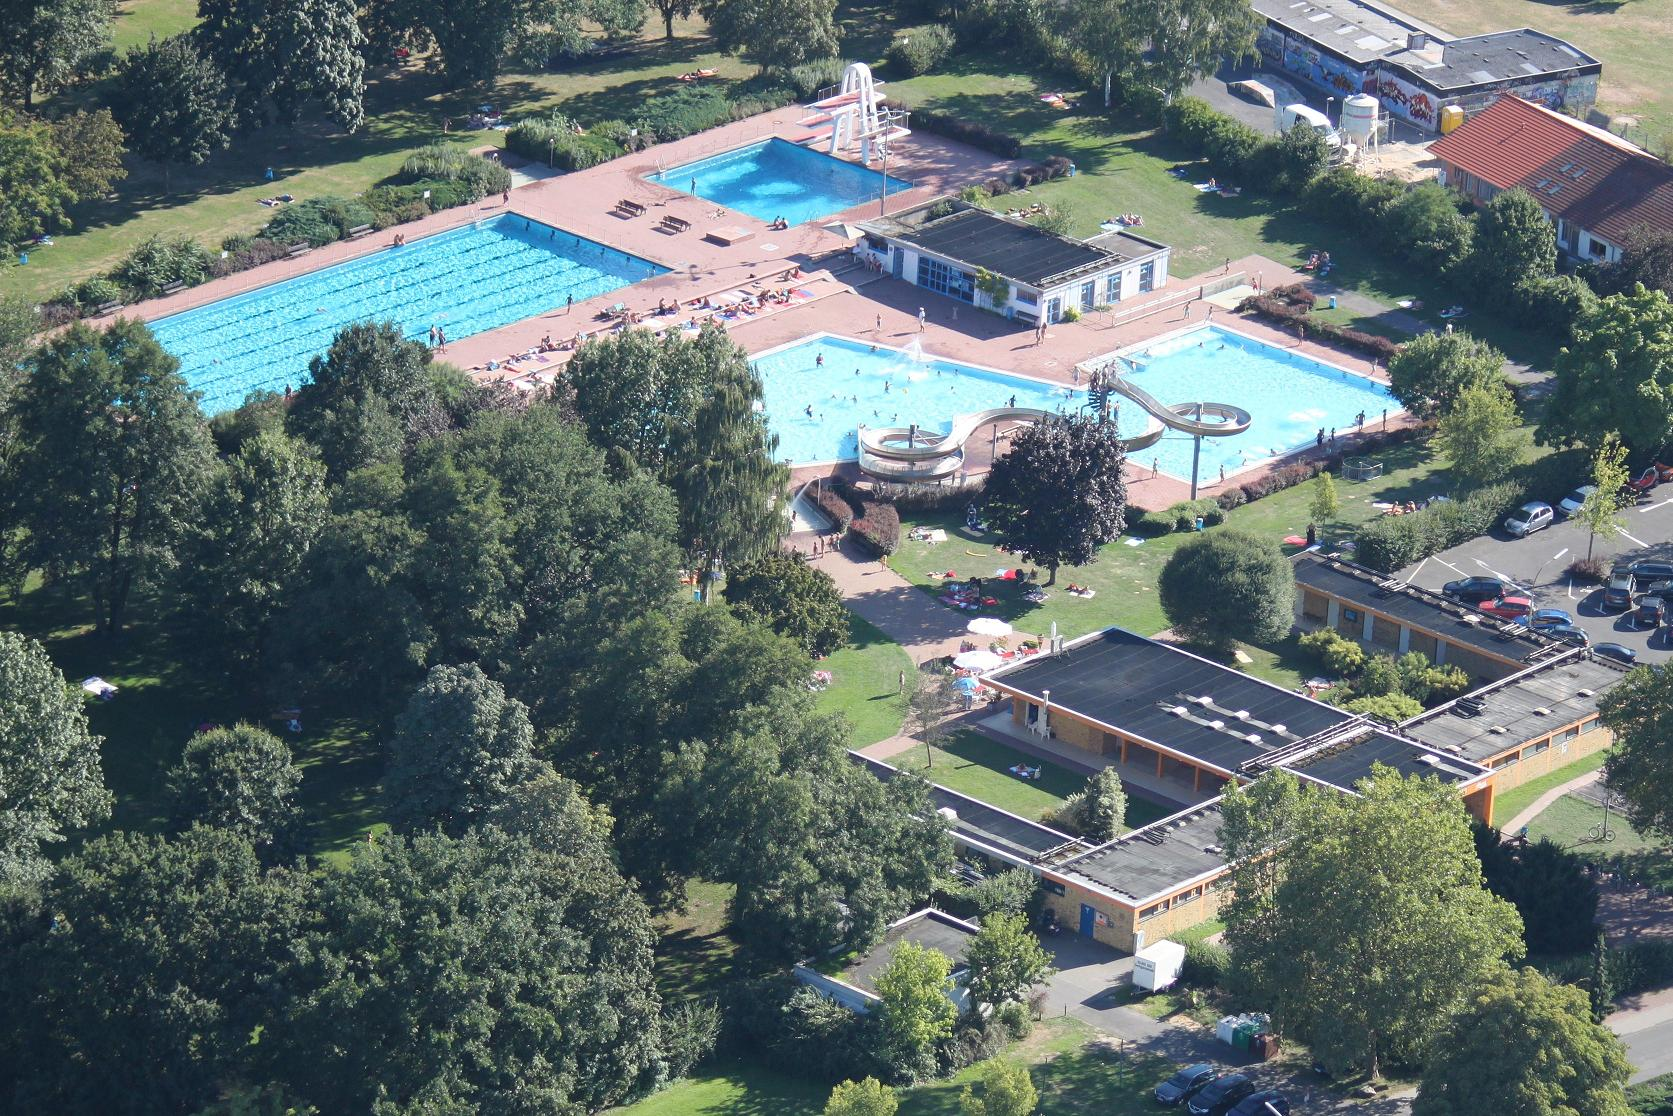 Die dlrg dlrg ortsgruppe seligenstadt for Seligenstadt schwimmbad